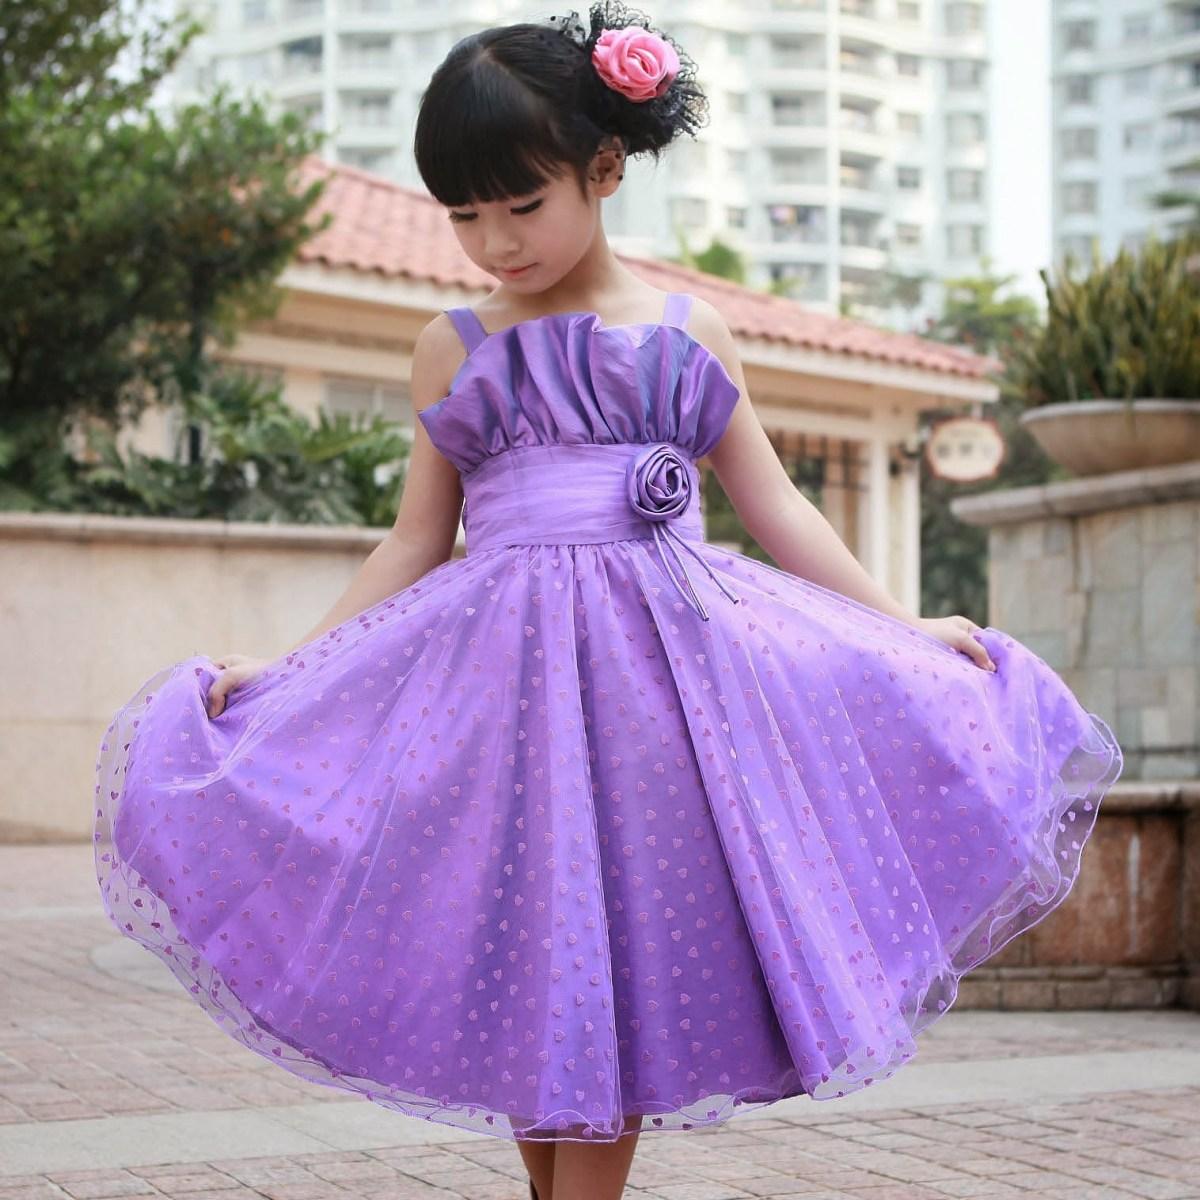 new fashion styles kids eid dress girls collection 2013